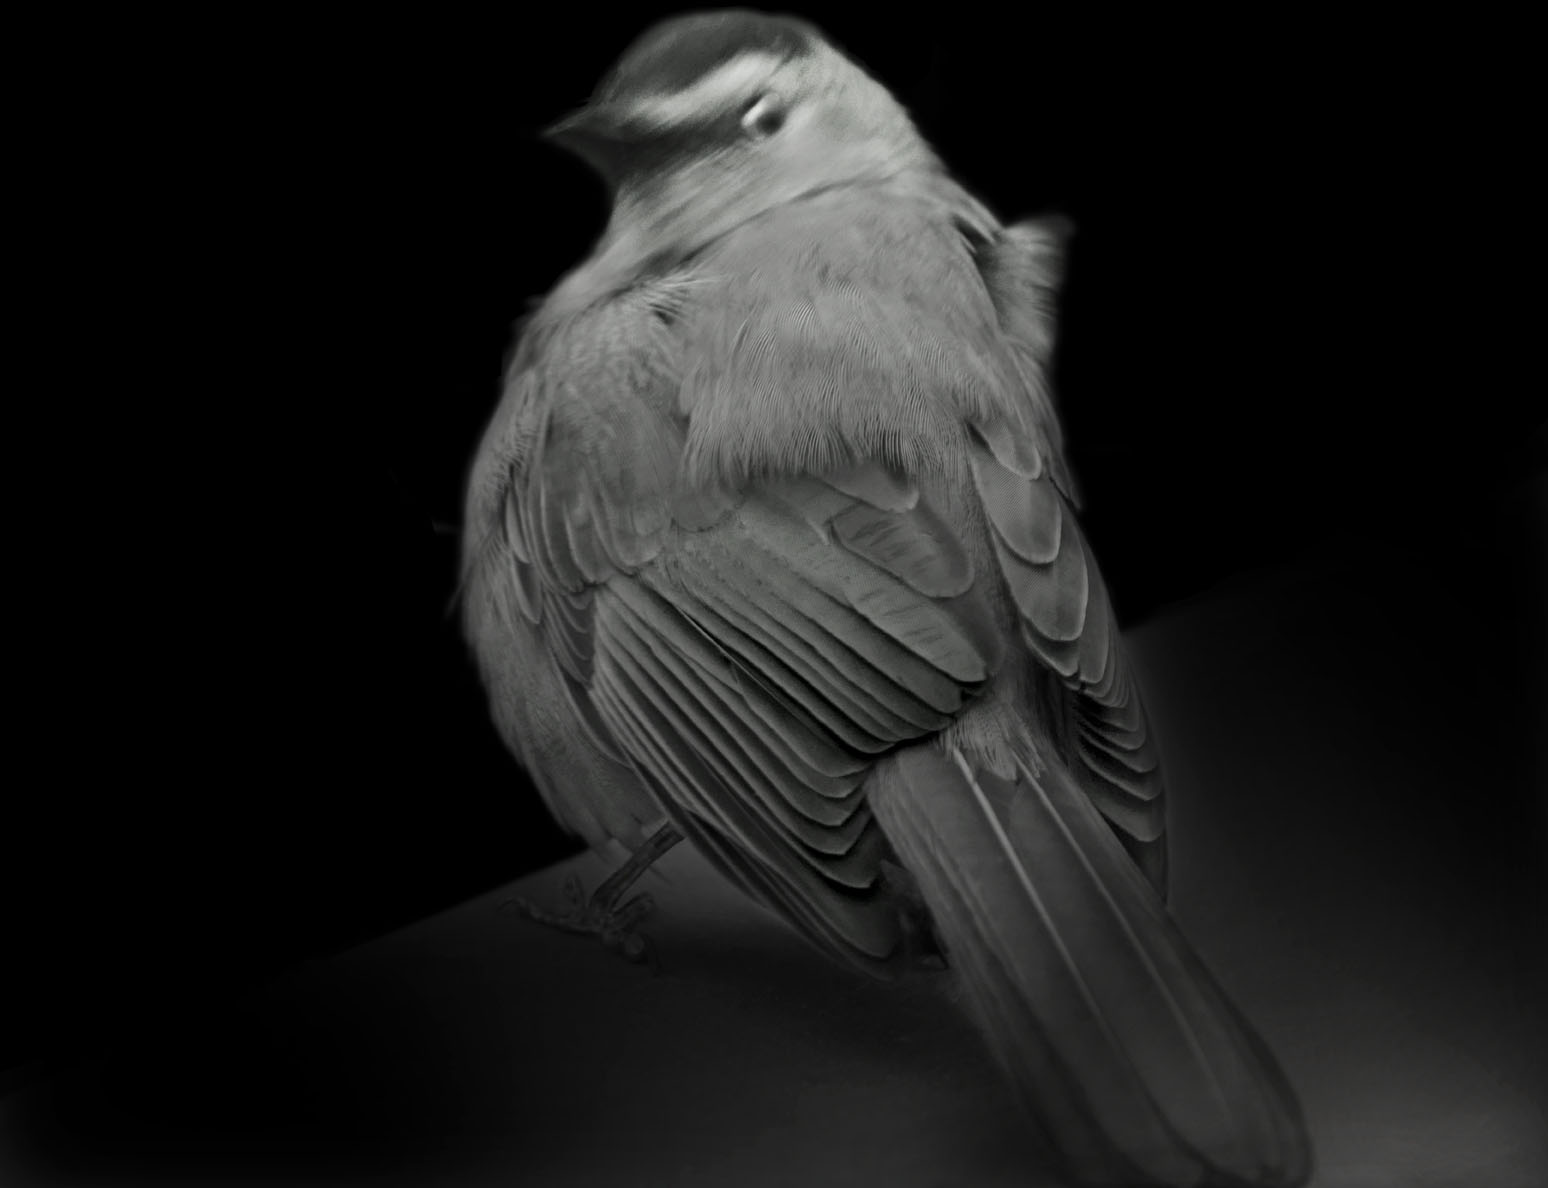 Gray Catbird, 2015. Copyright Elliot Ross. All rights reserved